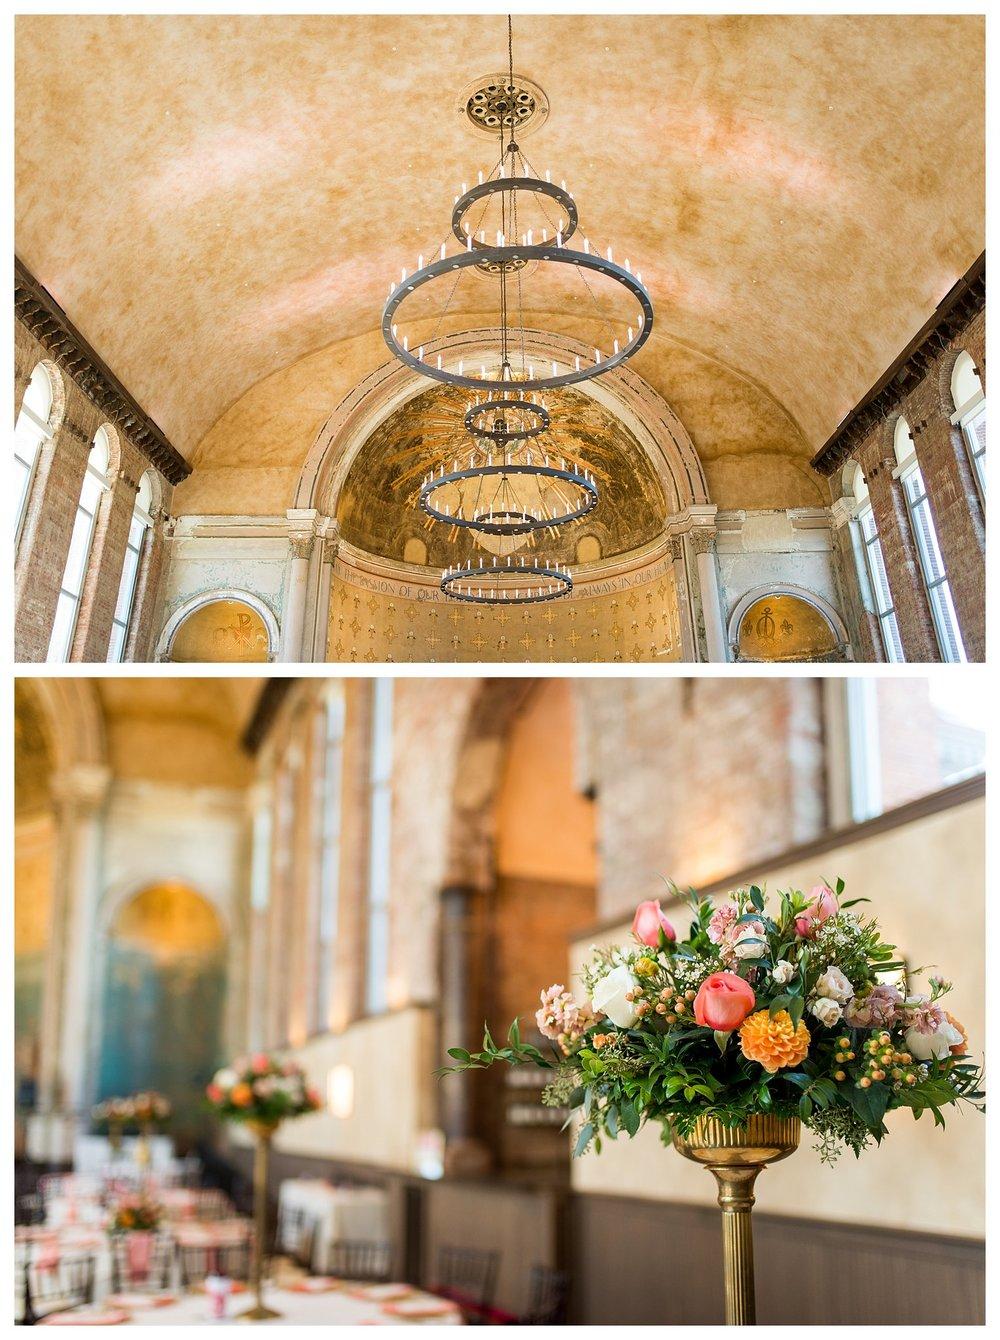 everleigh-photography-monastery-event-center-cincinnati-wedding-photographer-tara-and-elliot-heil-wedding-53